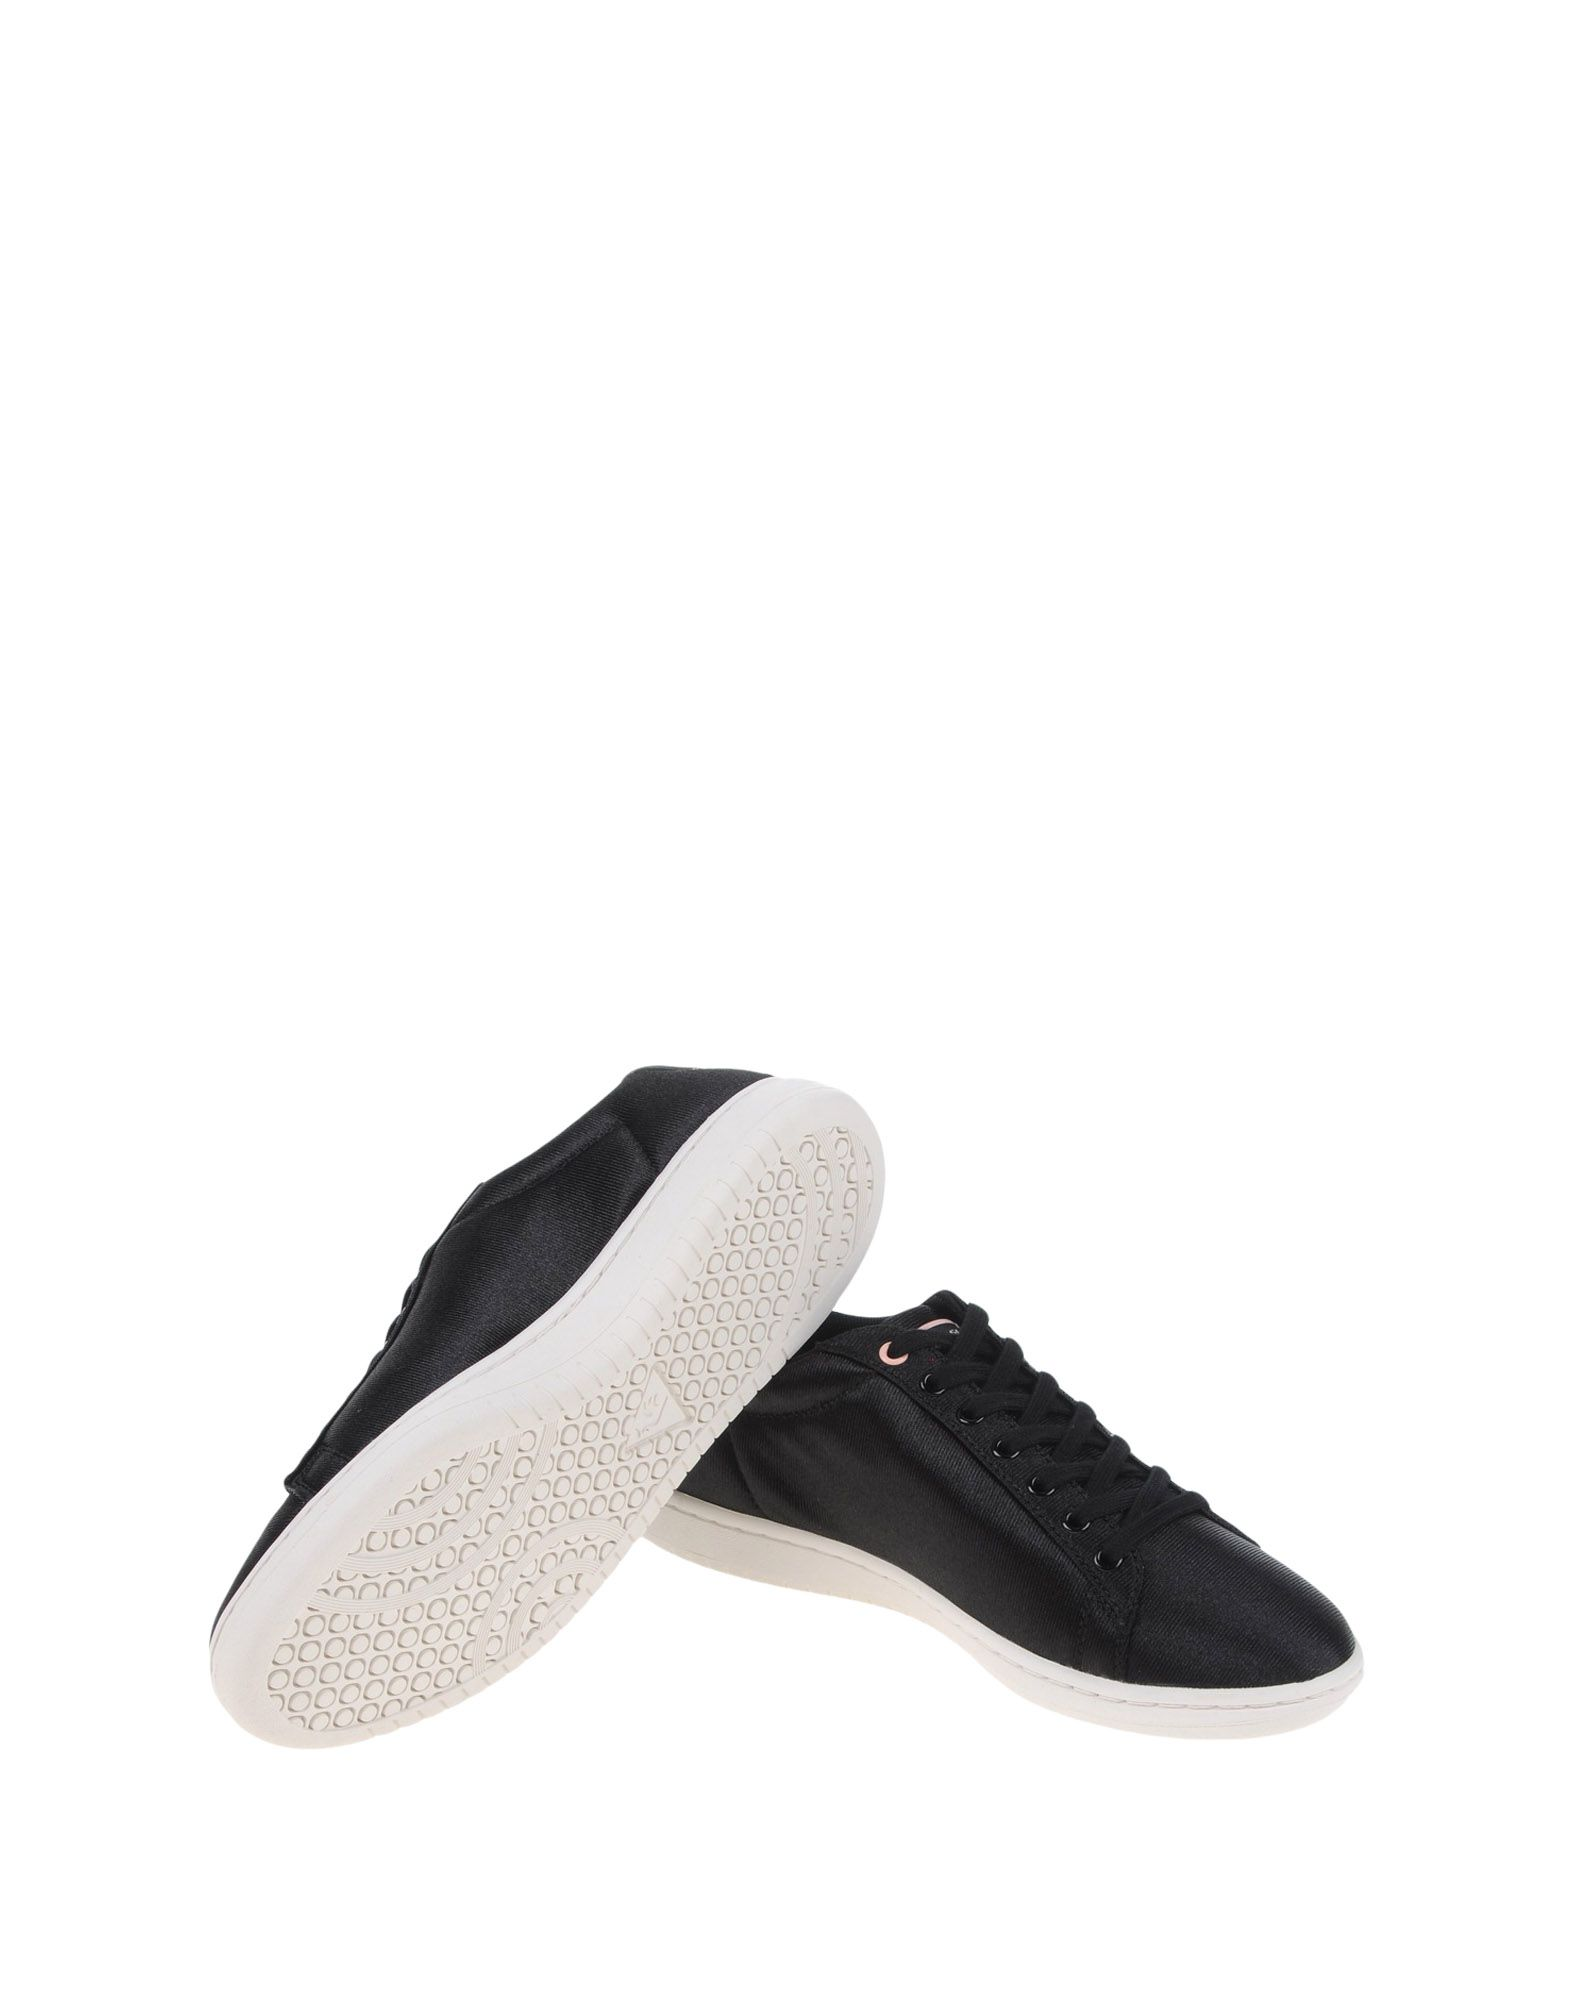 Sneakers Le Coq Sportif Arthur Ashe W Bird Of Paradise - Femme - Sneakers Le Coq Sportif sur